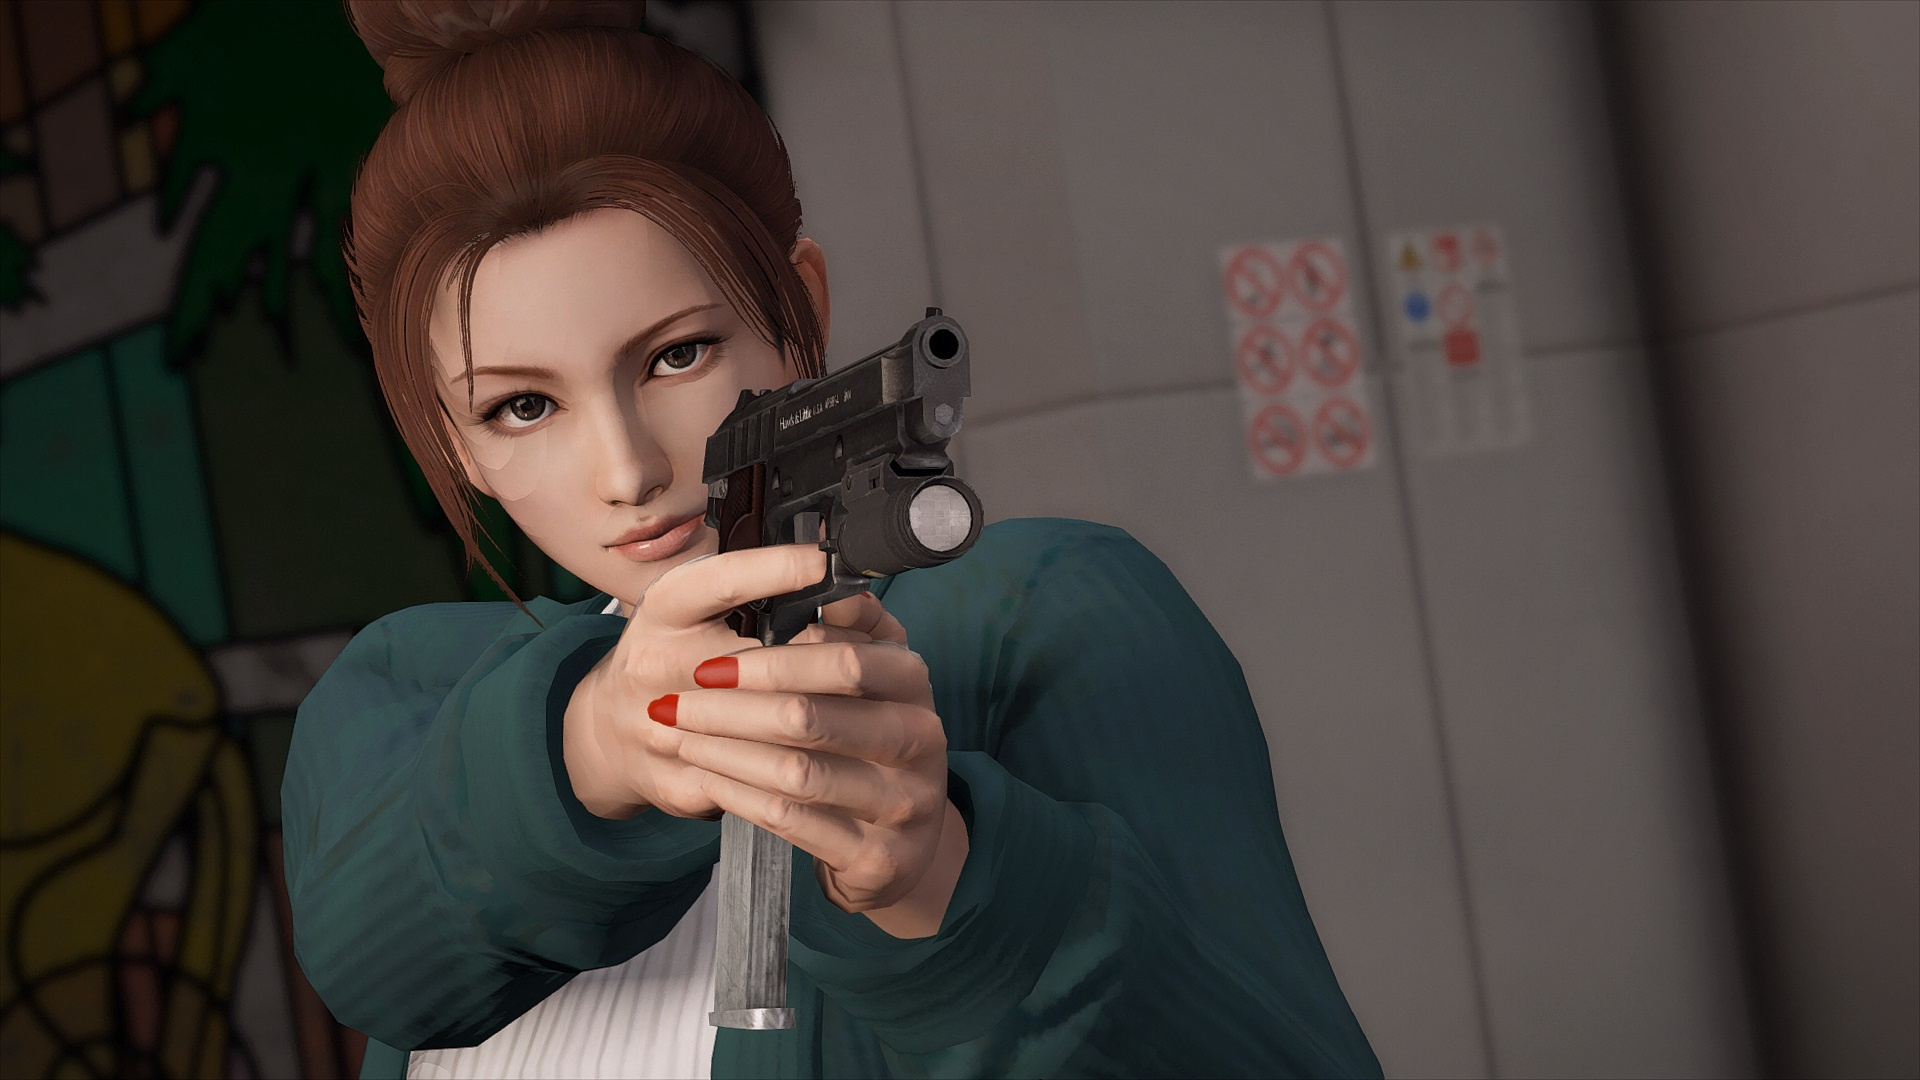 Mai Shiranui Dead Or Alive 5 [Add-On Ped | Replace] - GTA5